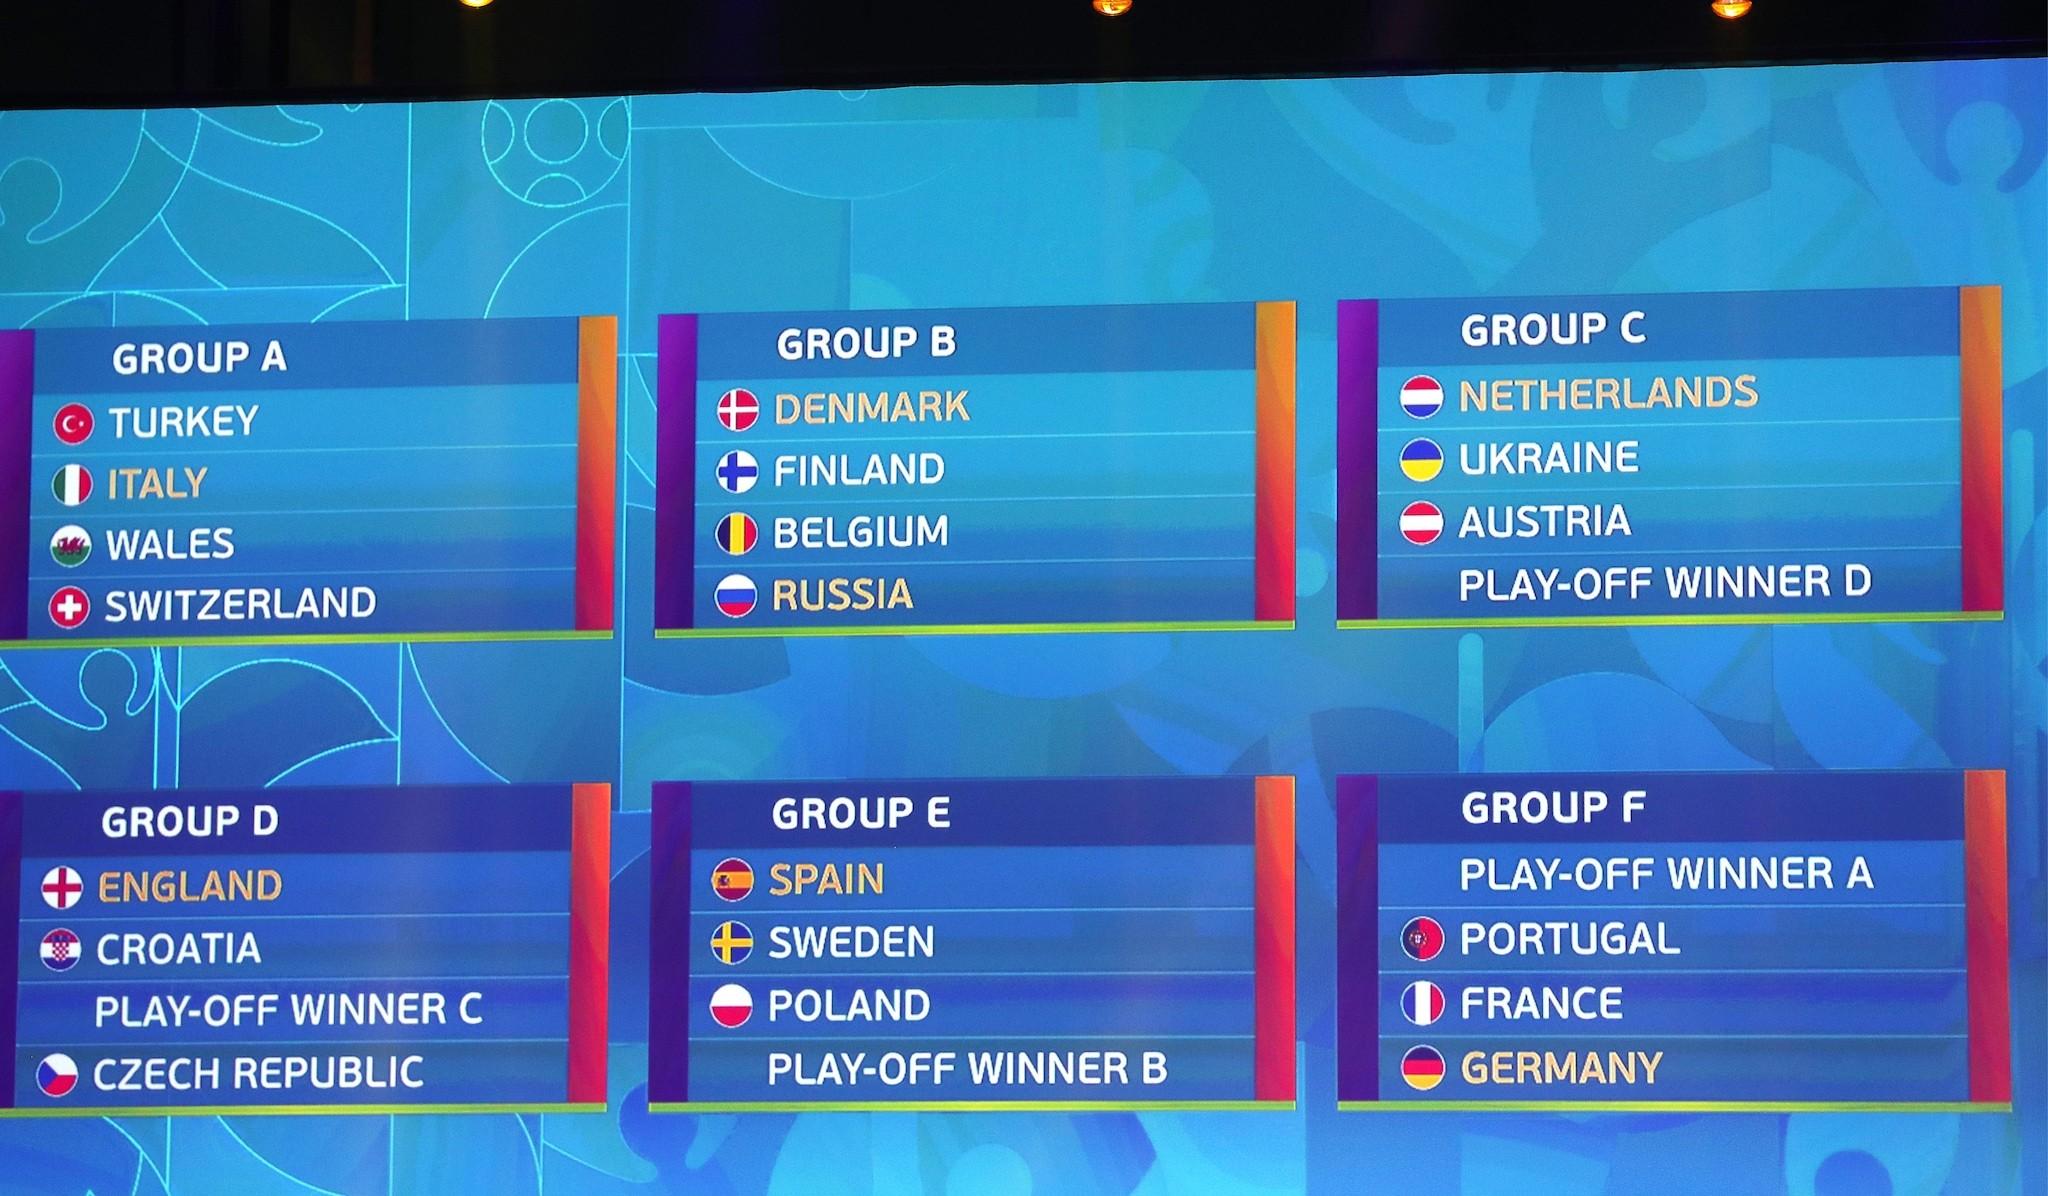 0253 0d e9430 34fcf3537ab6 1000 calendario de partidos de la uefa euro 2020